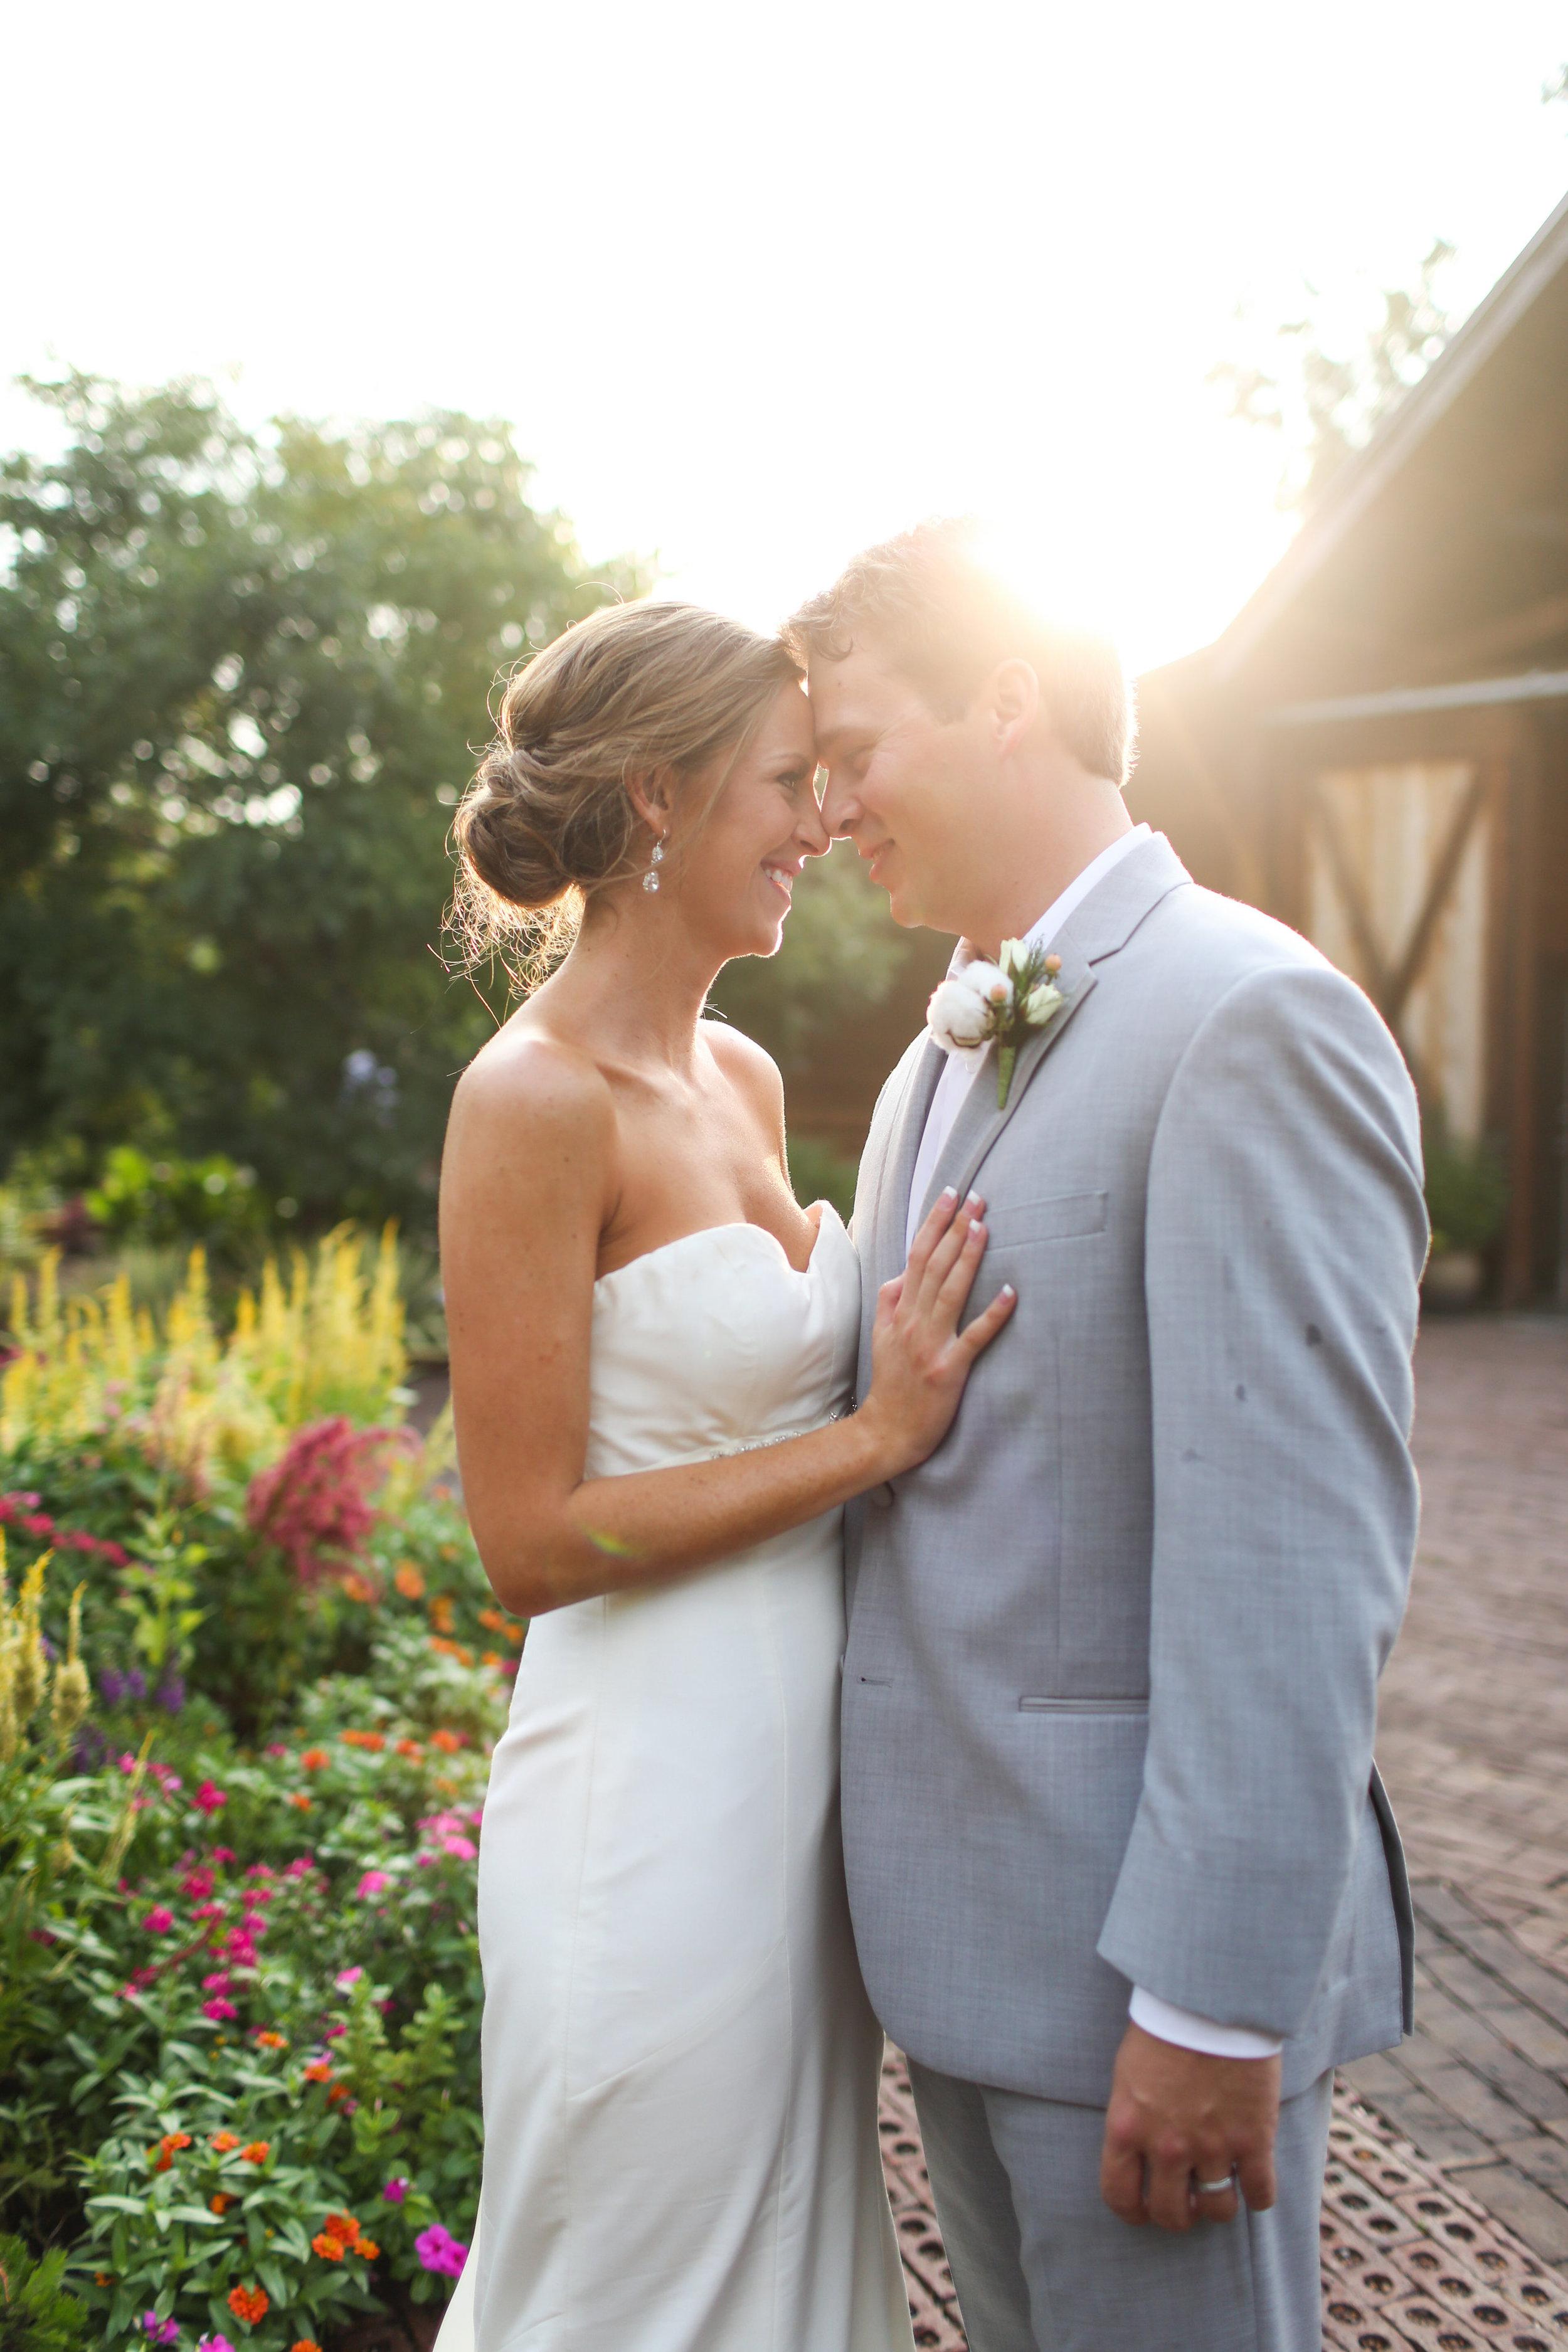 finnegan-photography-ivory-and-beau-bridal-boutique-nicole-miller-dakota-jaclyn-jordan-anne-veil-savannah-bridal-boutique-savannah-wedding-dresses-savannah-weddings-statesboro-wedding-barn-wedding-savannah-bridal-georgia-bridal-boutique-16.jpg